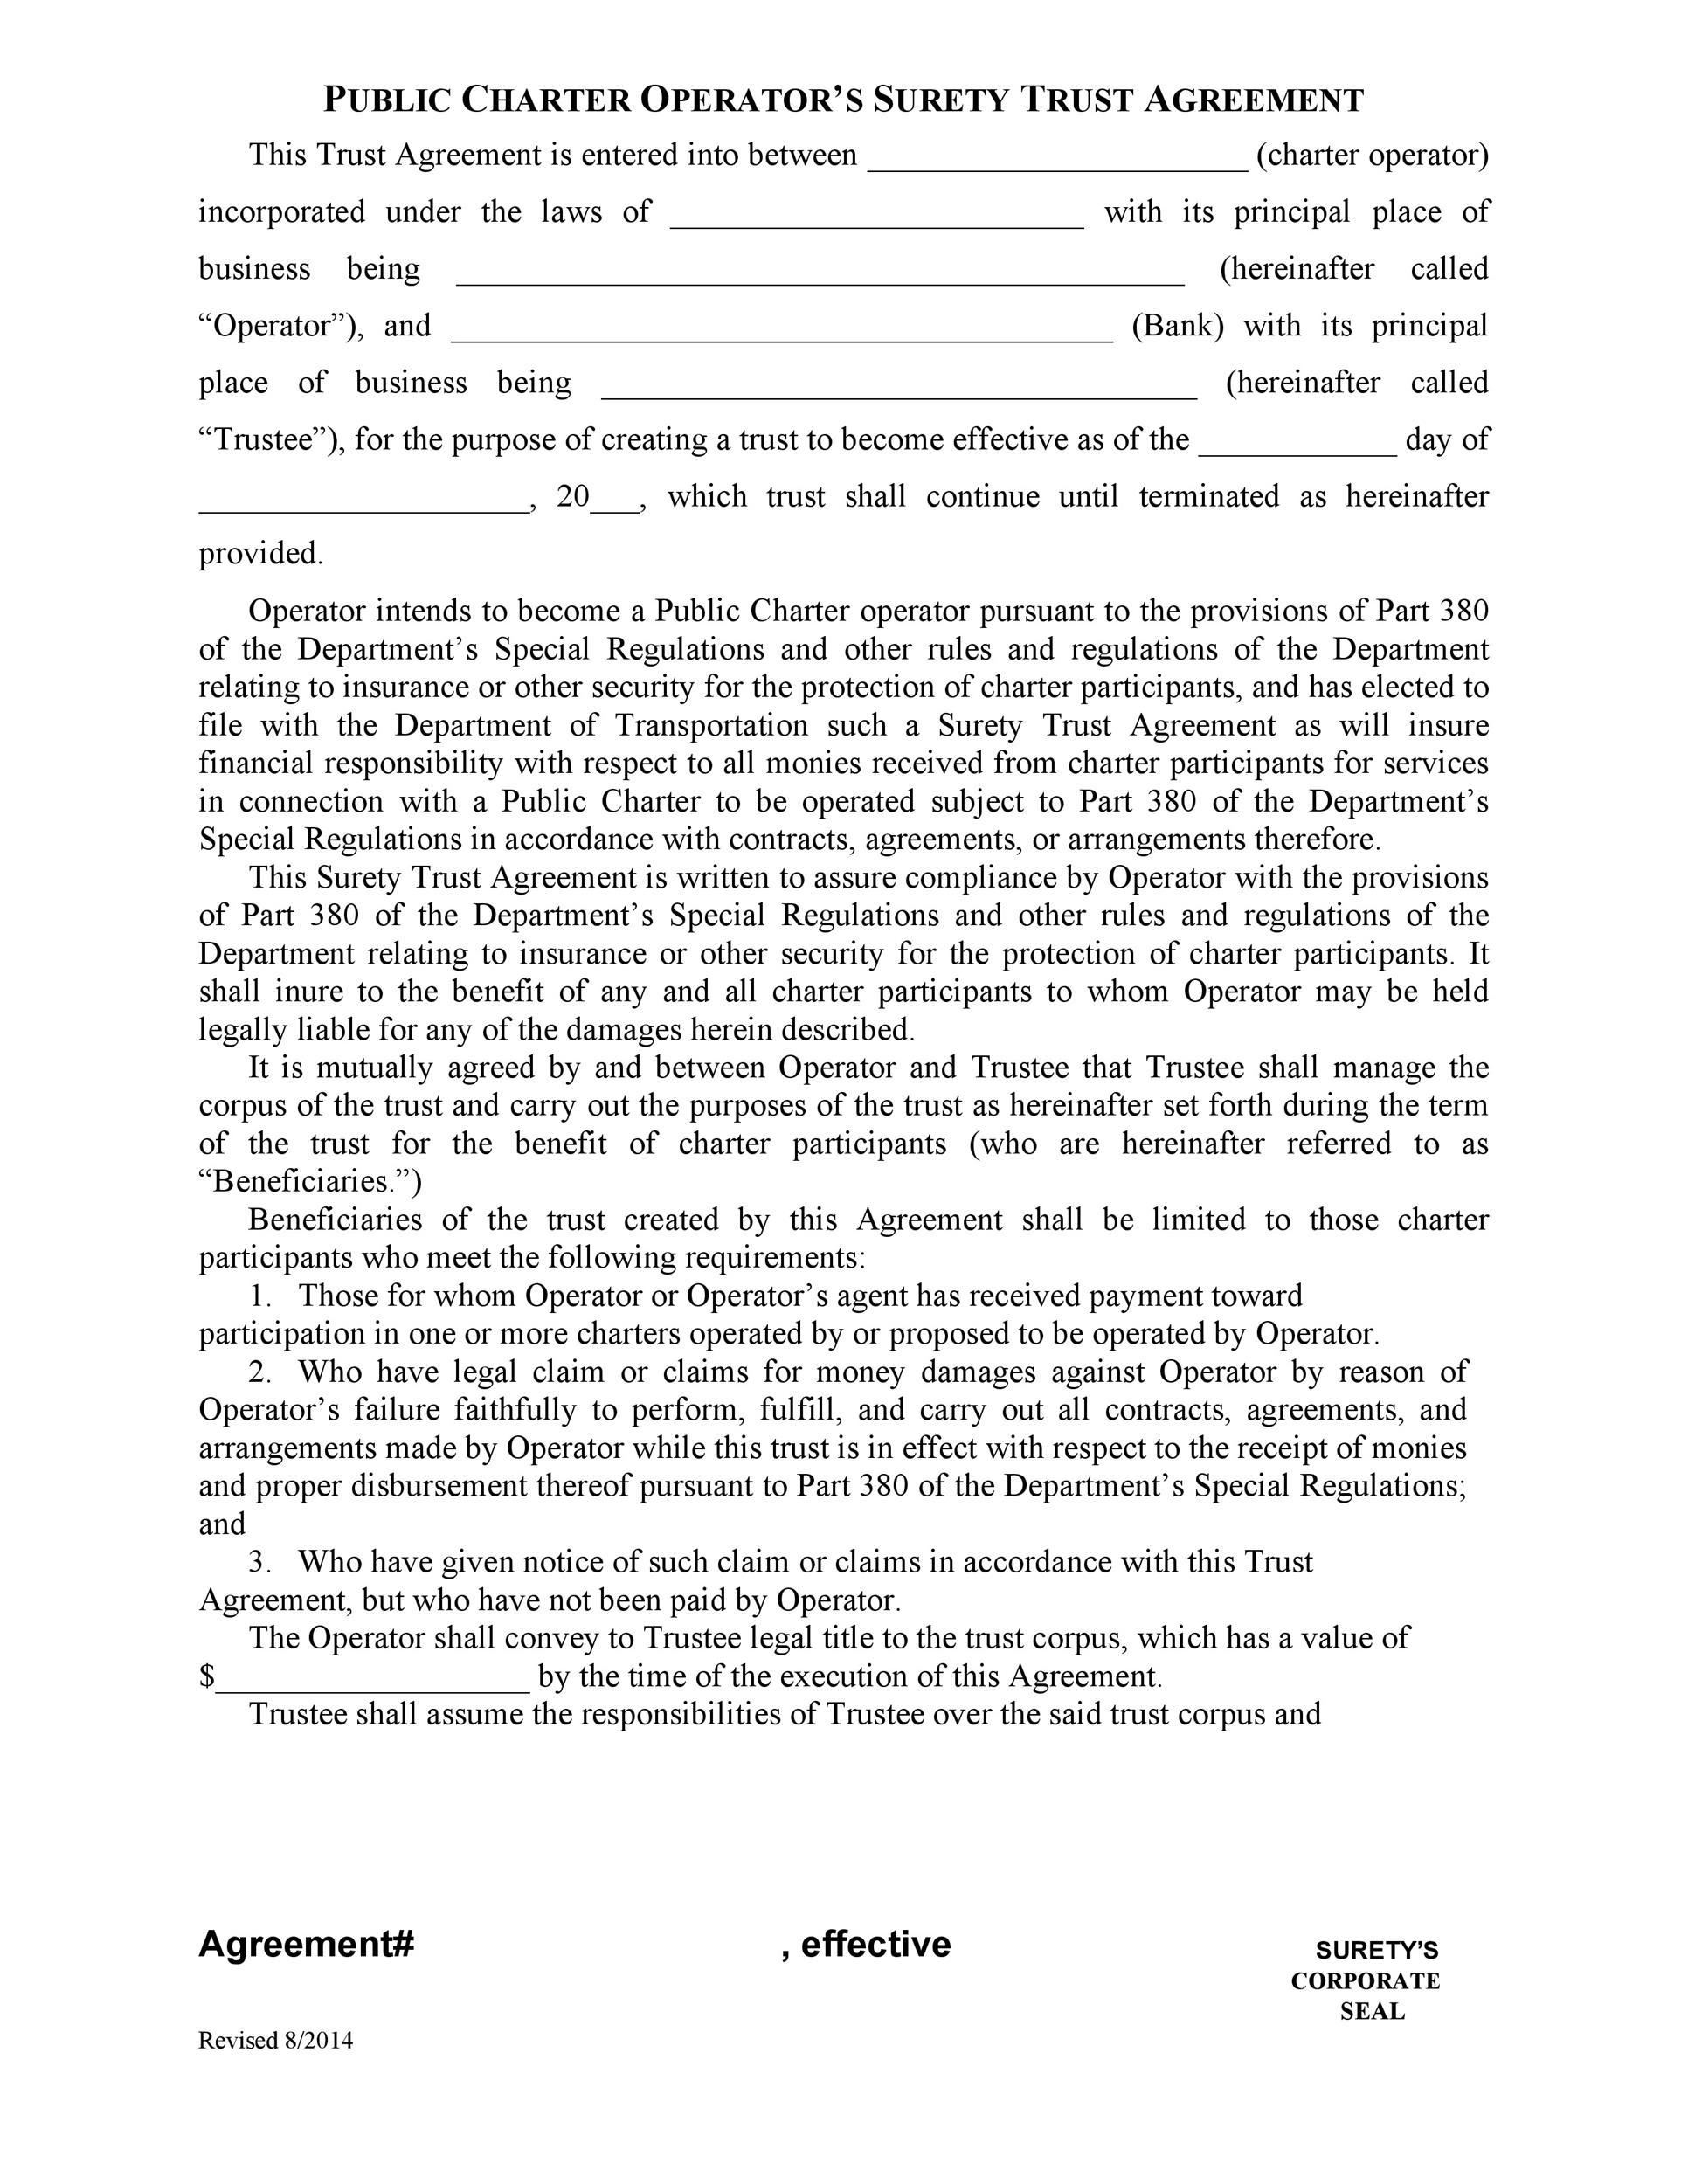 Free trust agreement 19